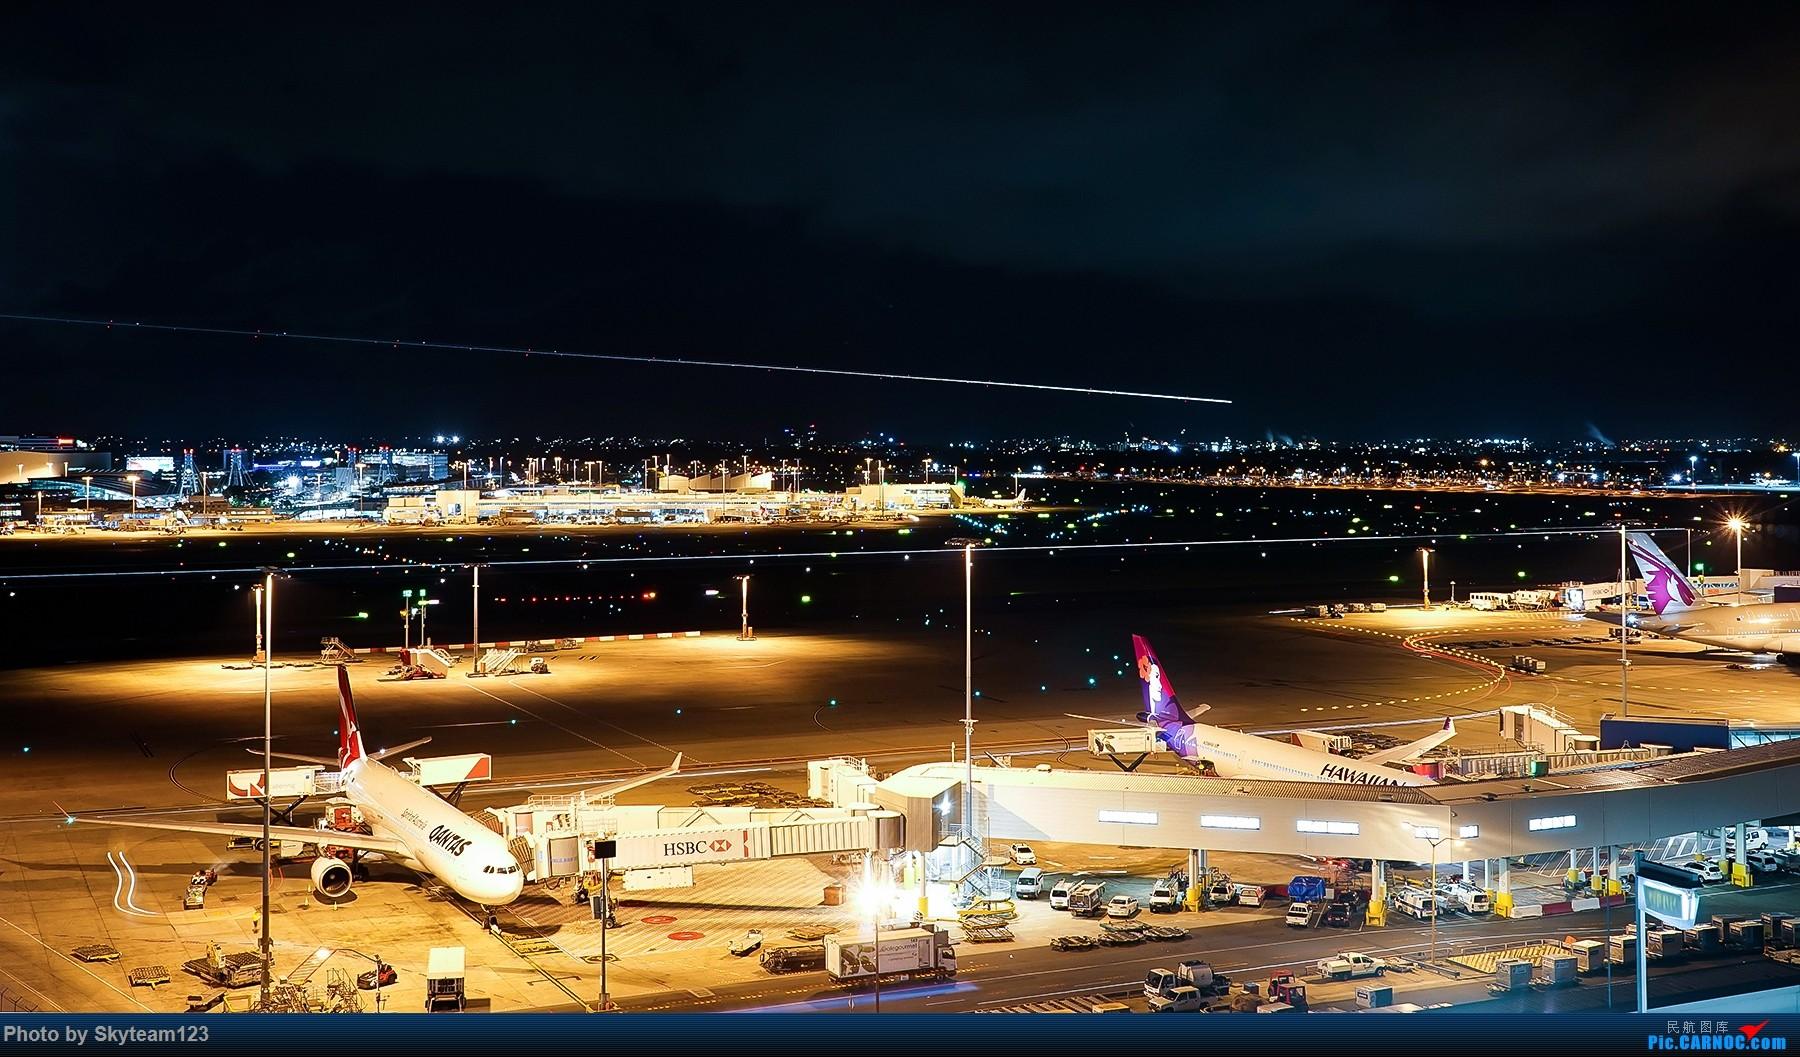 Re:[原创]【SYD】解锁T1国际航站旁停车场顶楼拍机位 下午16R抵达的好货们以及夜拍轨迹 AIRBUS A380-800 A6-APB  澳大利亚悉尼金斯福德·史密斯机场